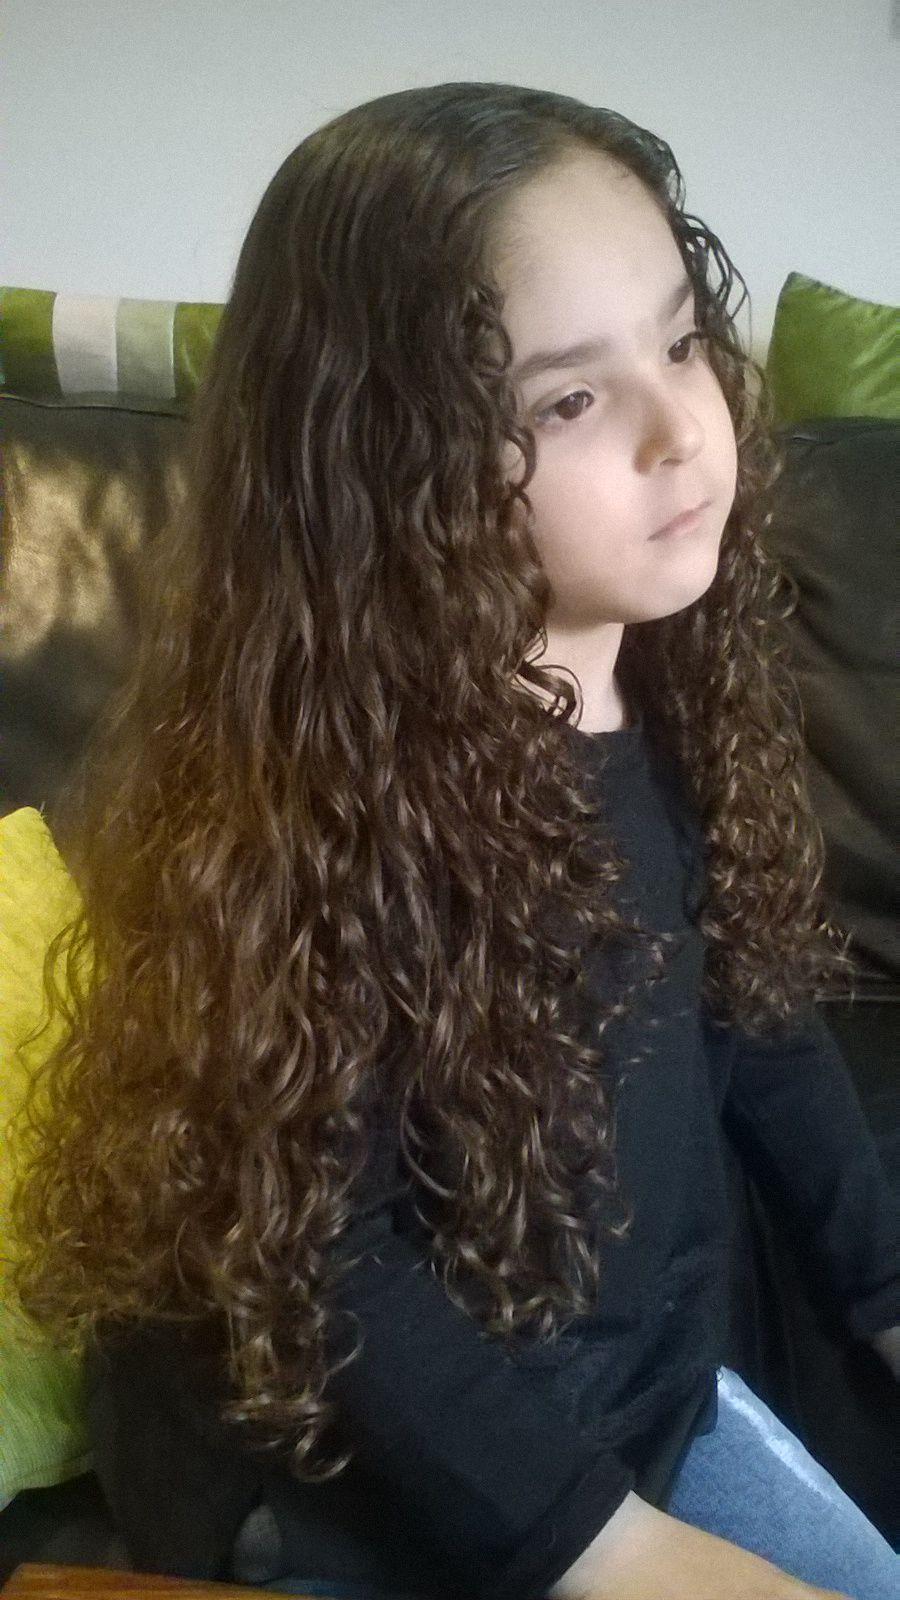 My little girl beautiful curly hair | Beautiful curly hair ...